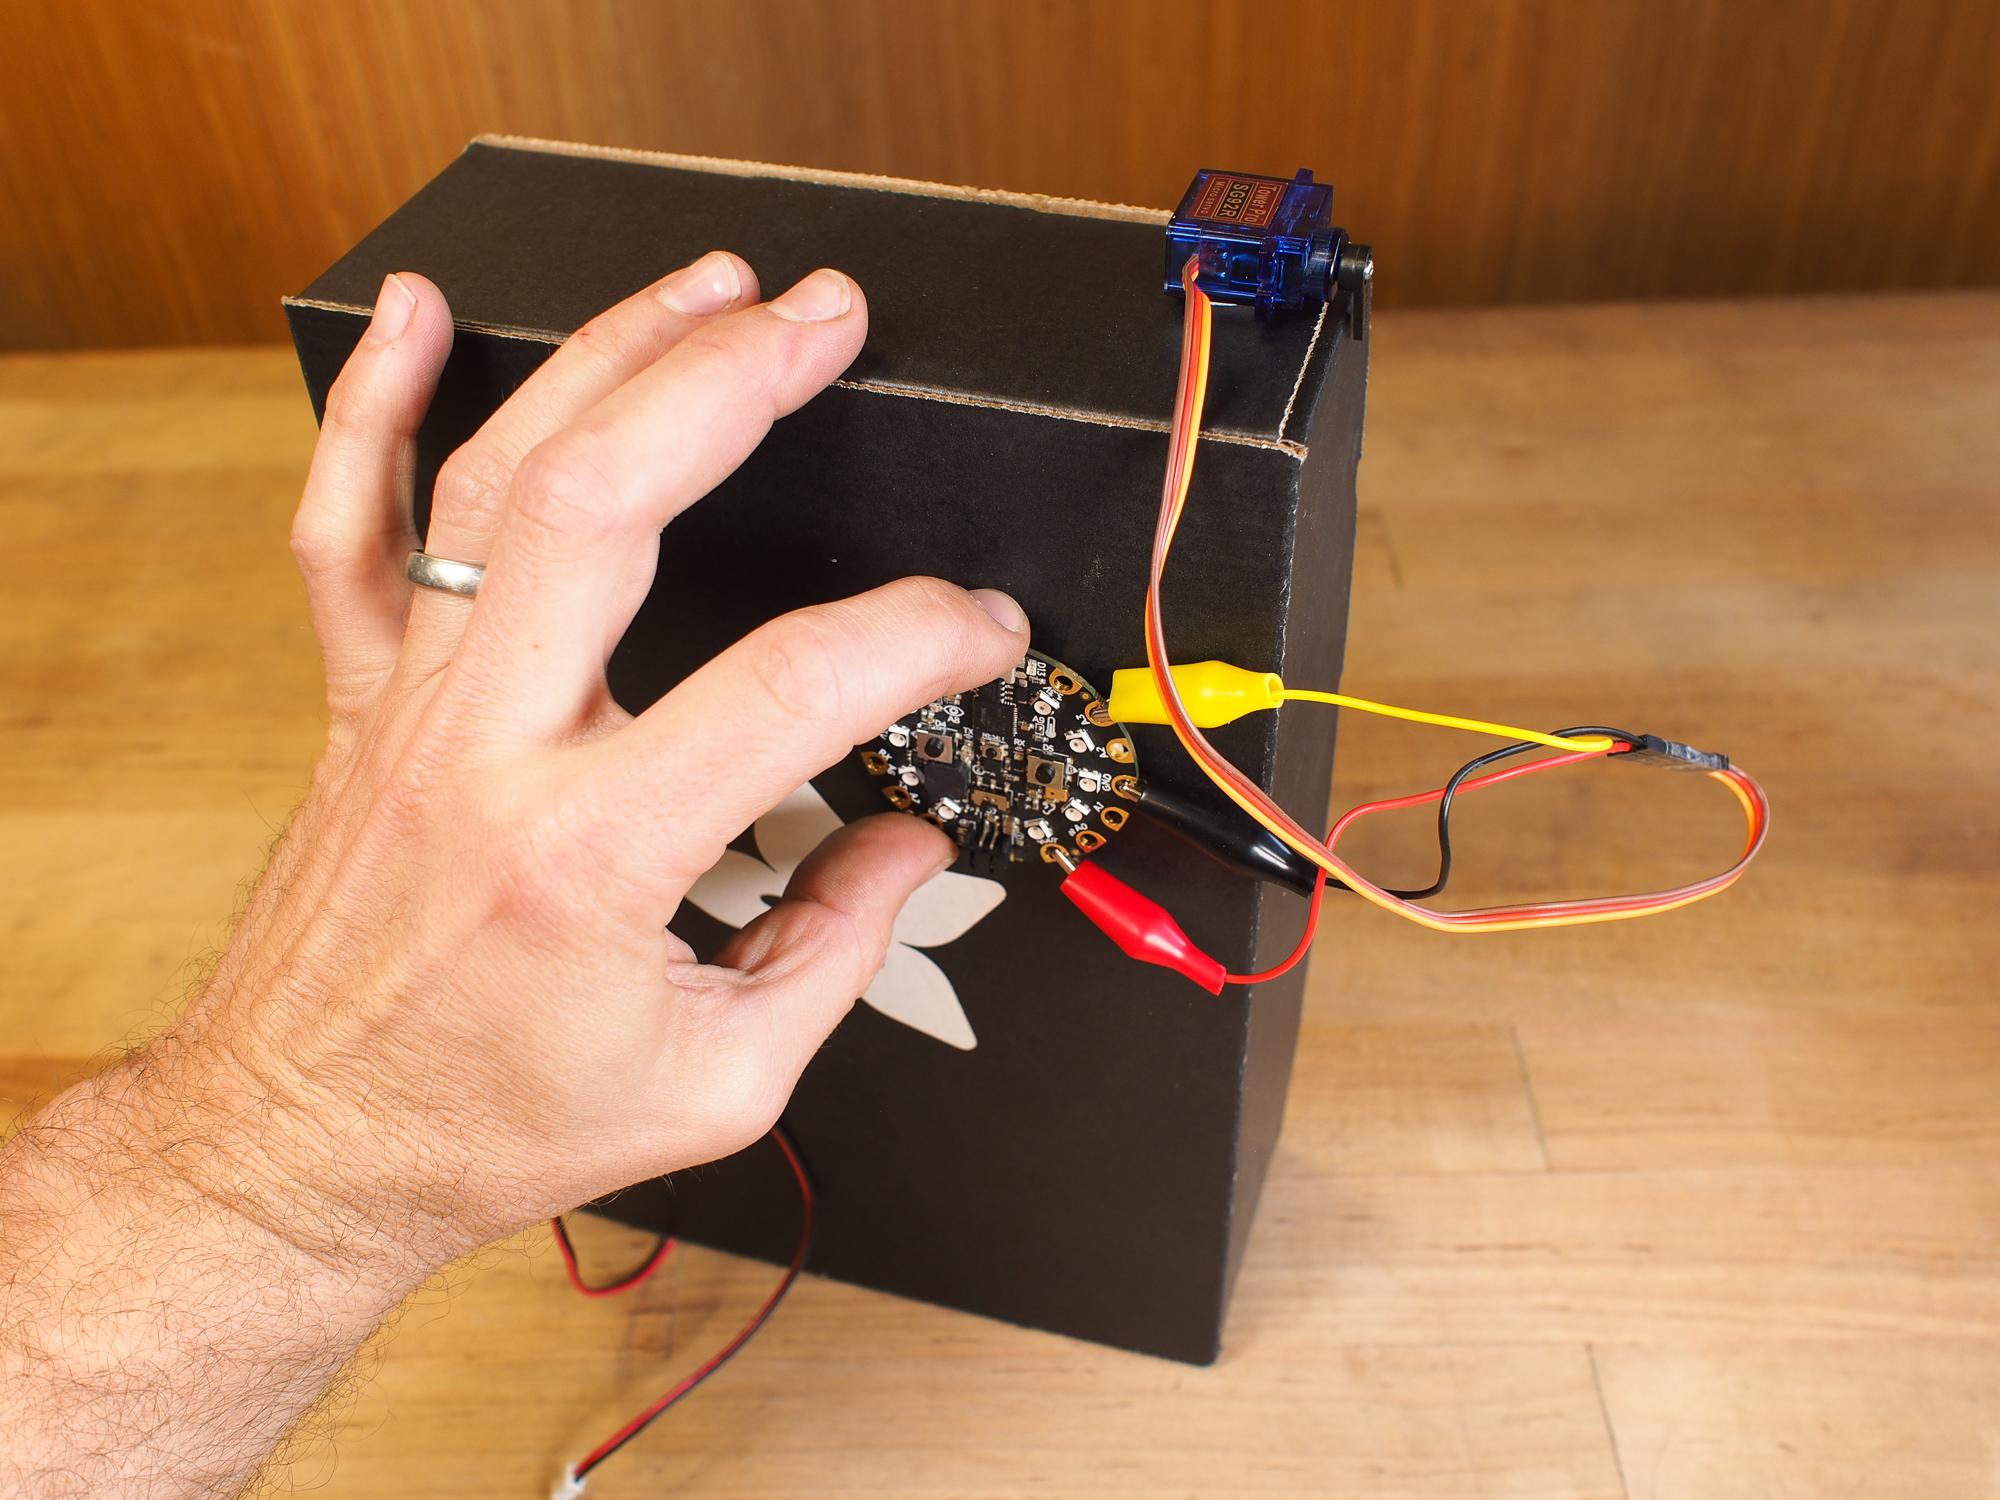 circuitpython_PC080477_2k.jpg